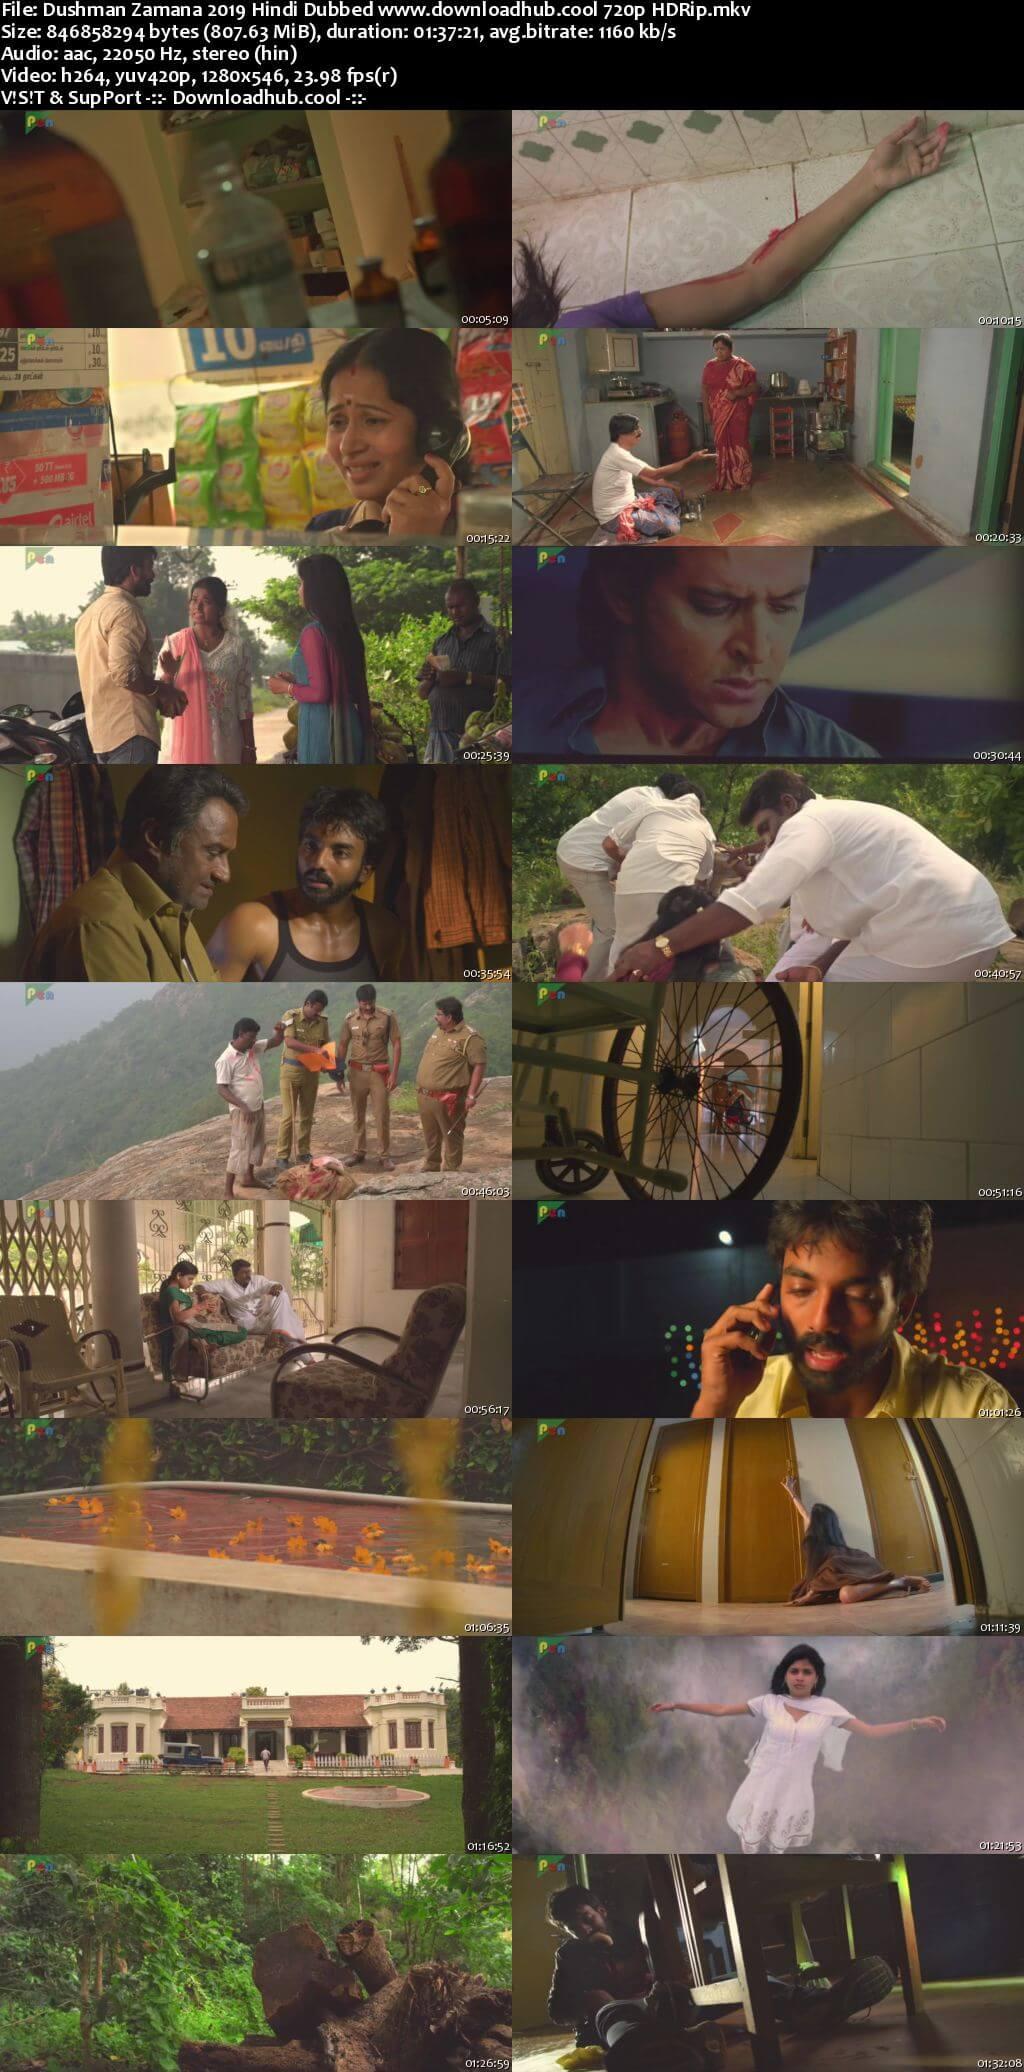 Dushman Zamana 2019 Hindi Dubbed 720p HDRip x264